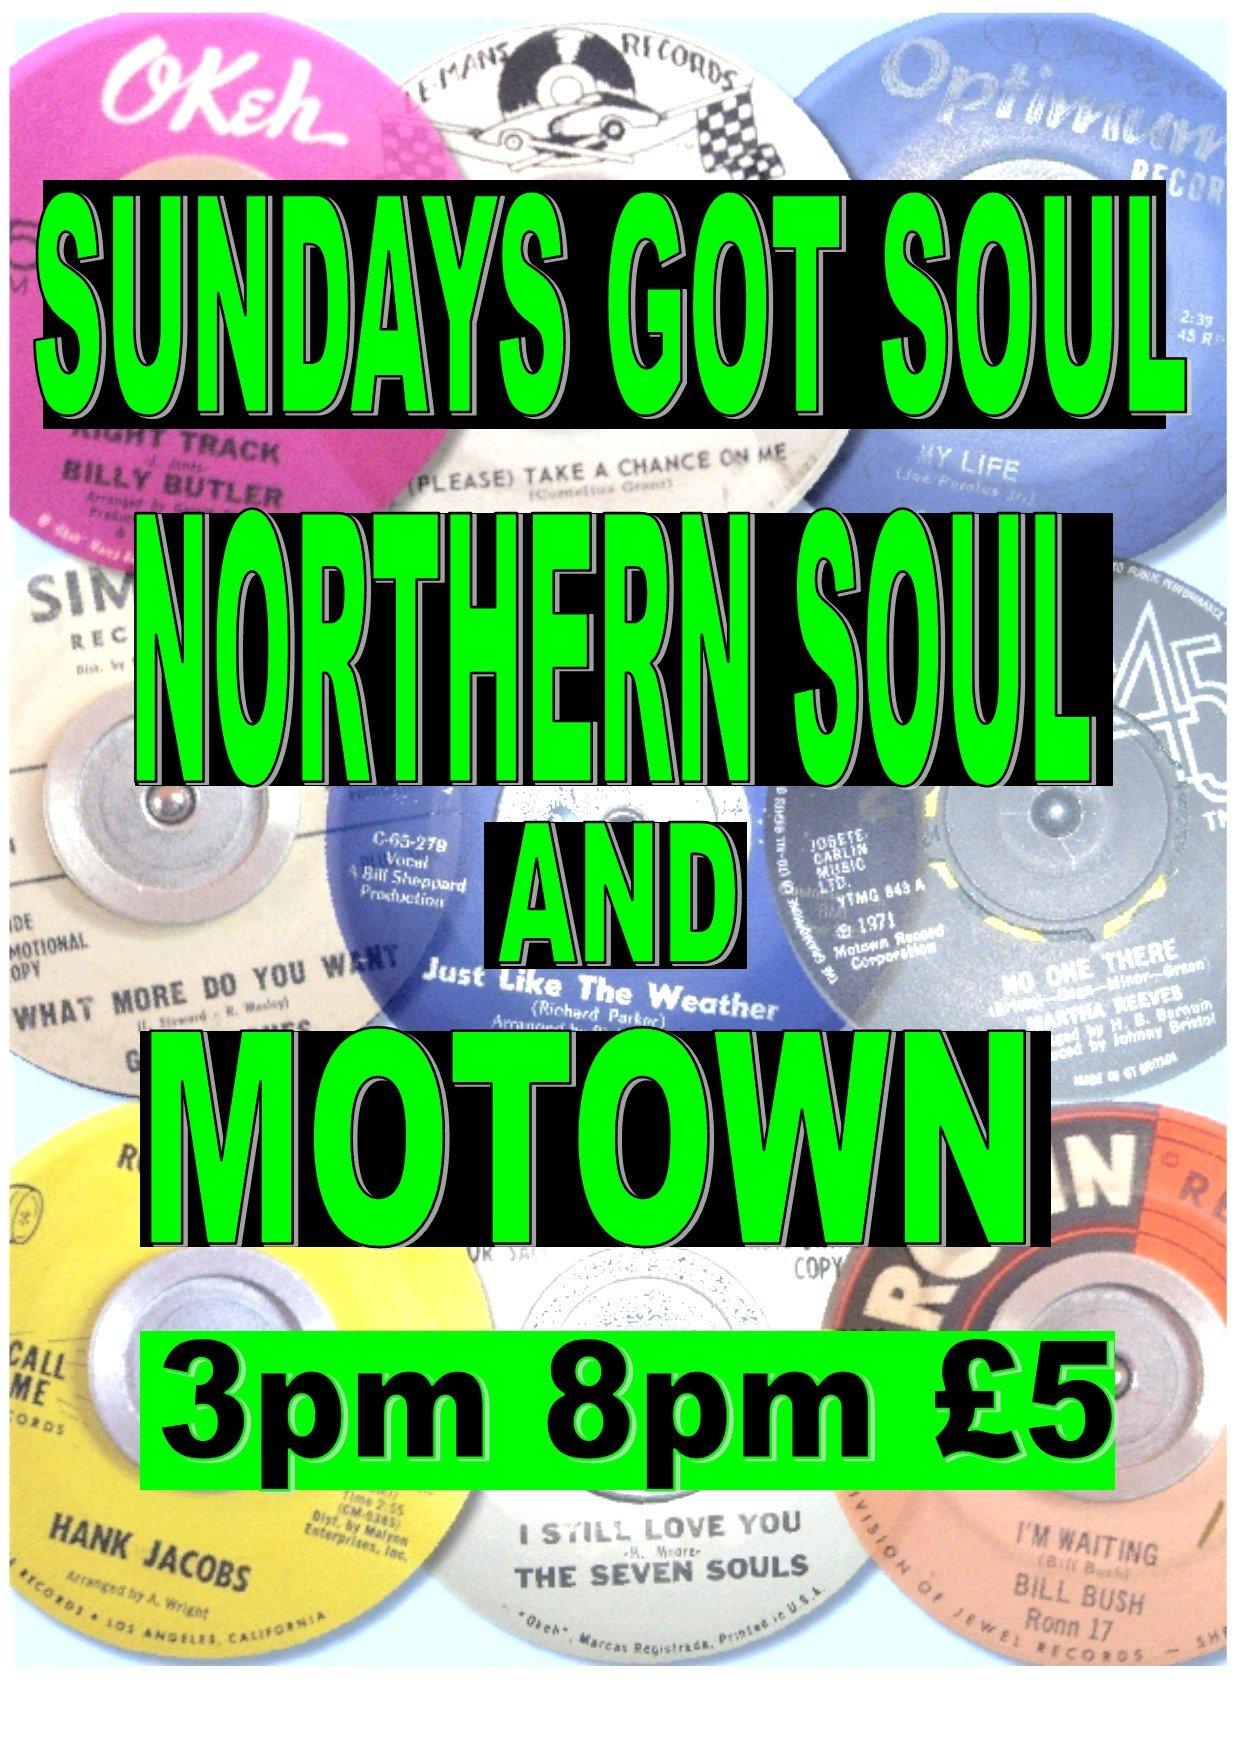 Sundays Got Soul Northern Soul  Motown Afternoon flyer